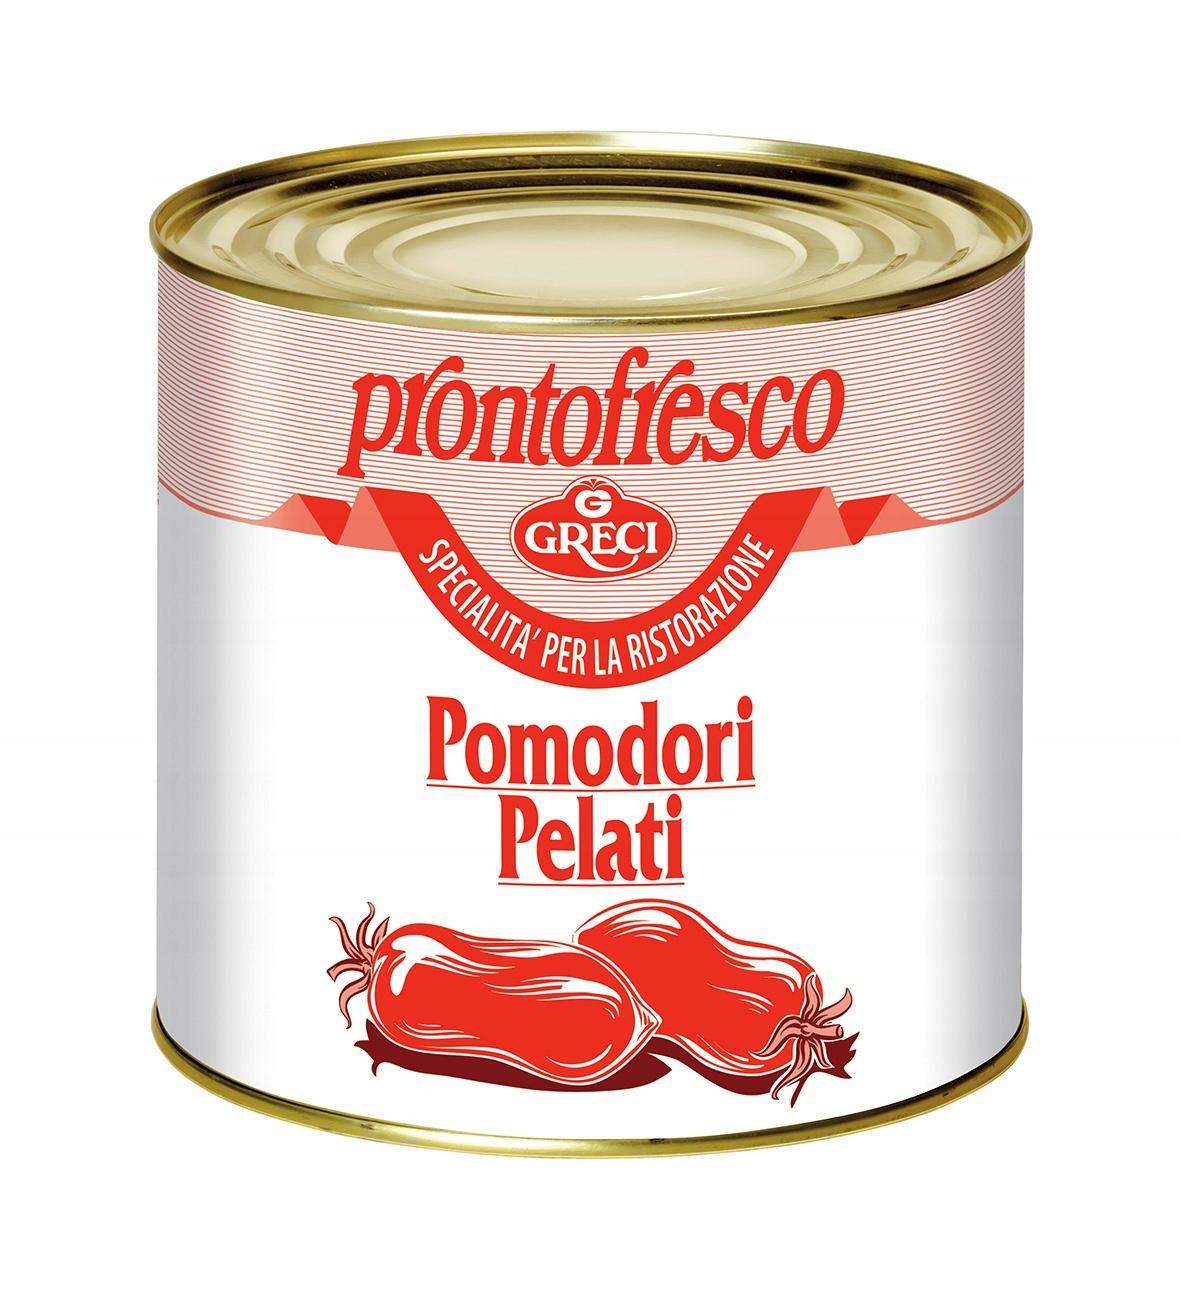 Помидоры Пелати ПРОНТОФРЕСКО 2,5 кг 4972